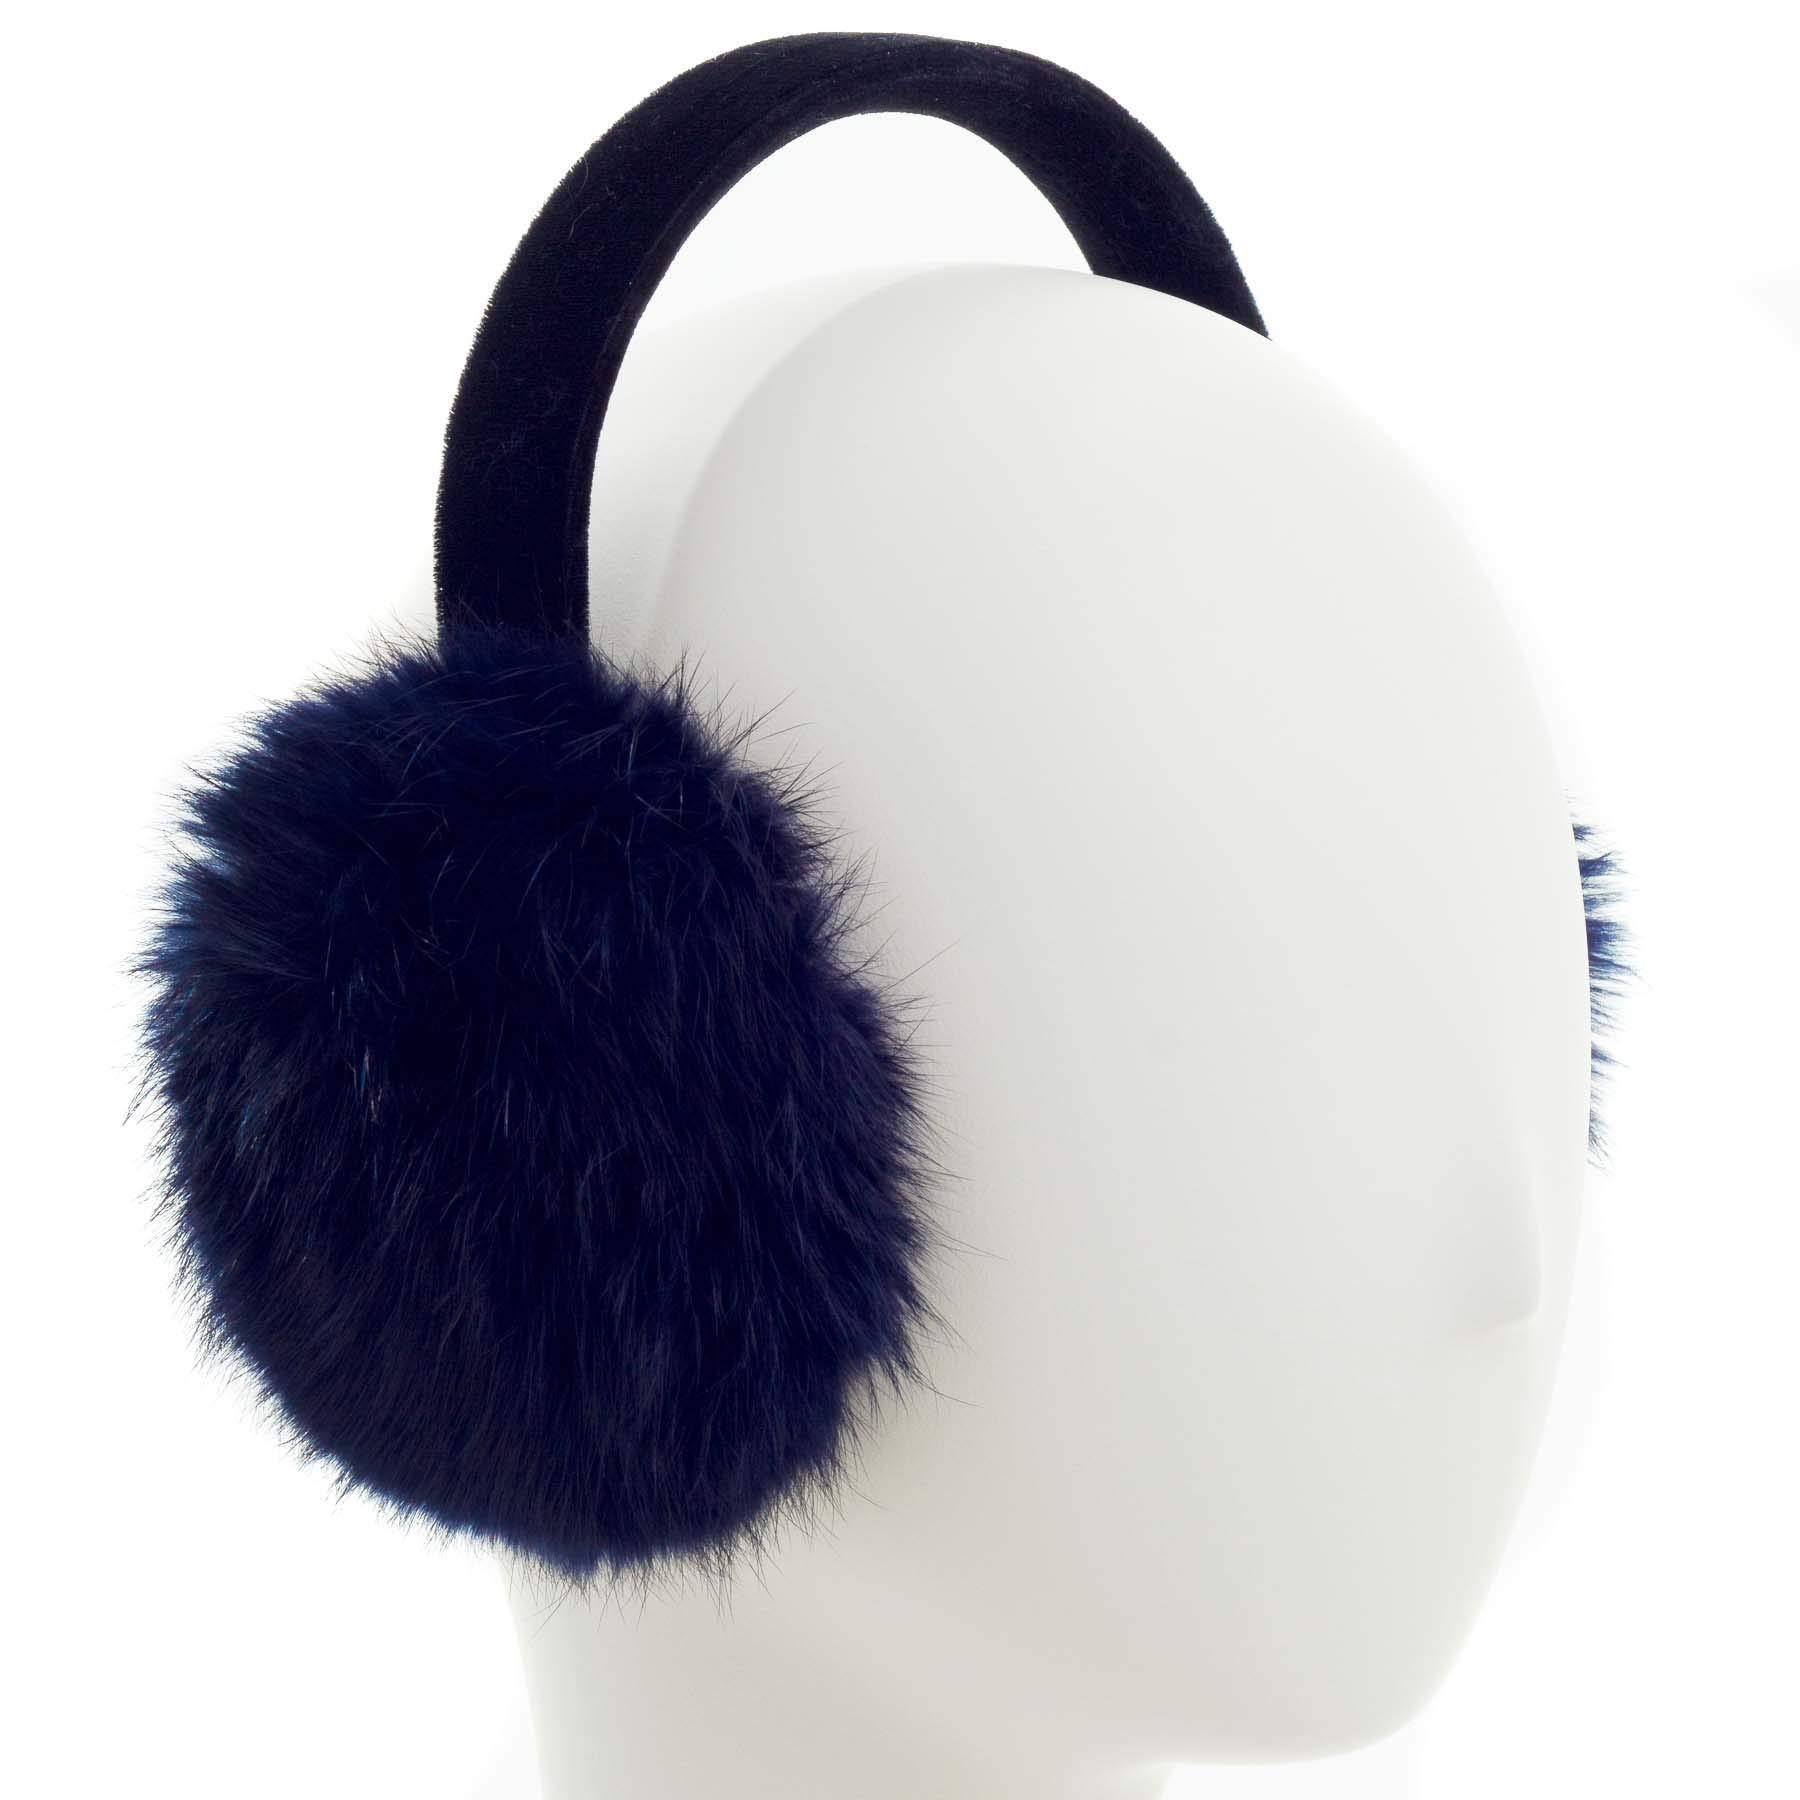 Surell Long Hair Rabbit Fur Earmuff with Velvet Band Winter Ear Warmer (Navy)